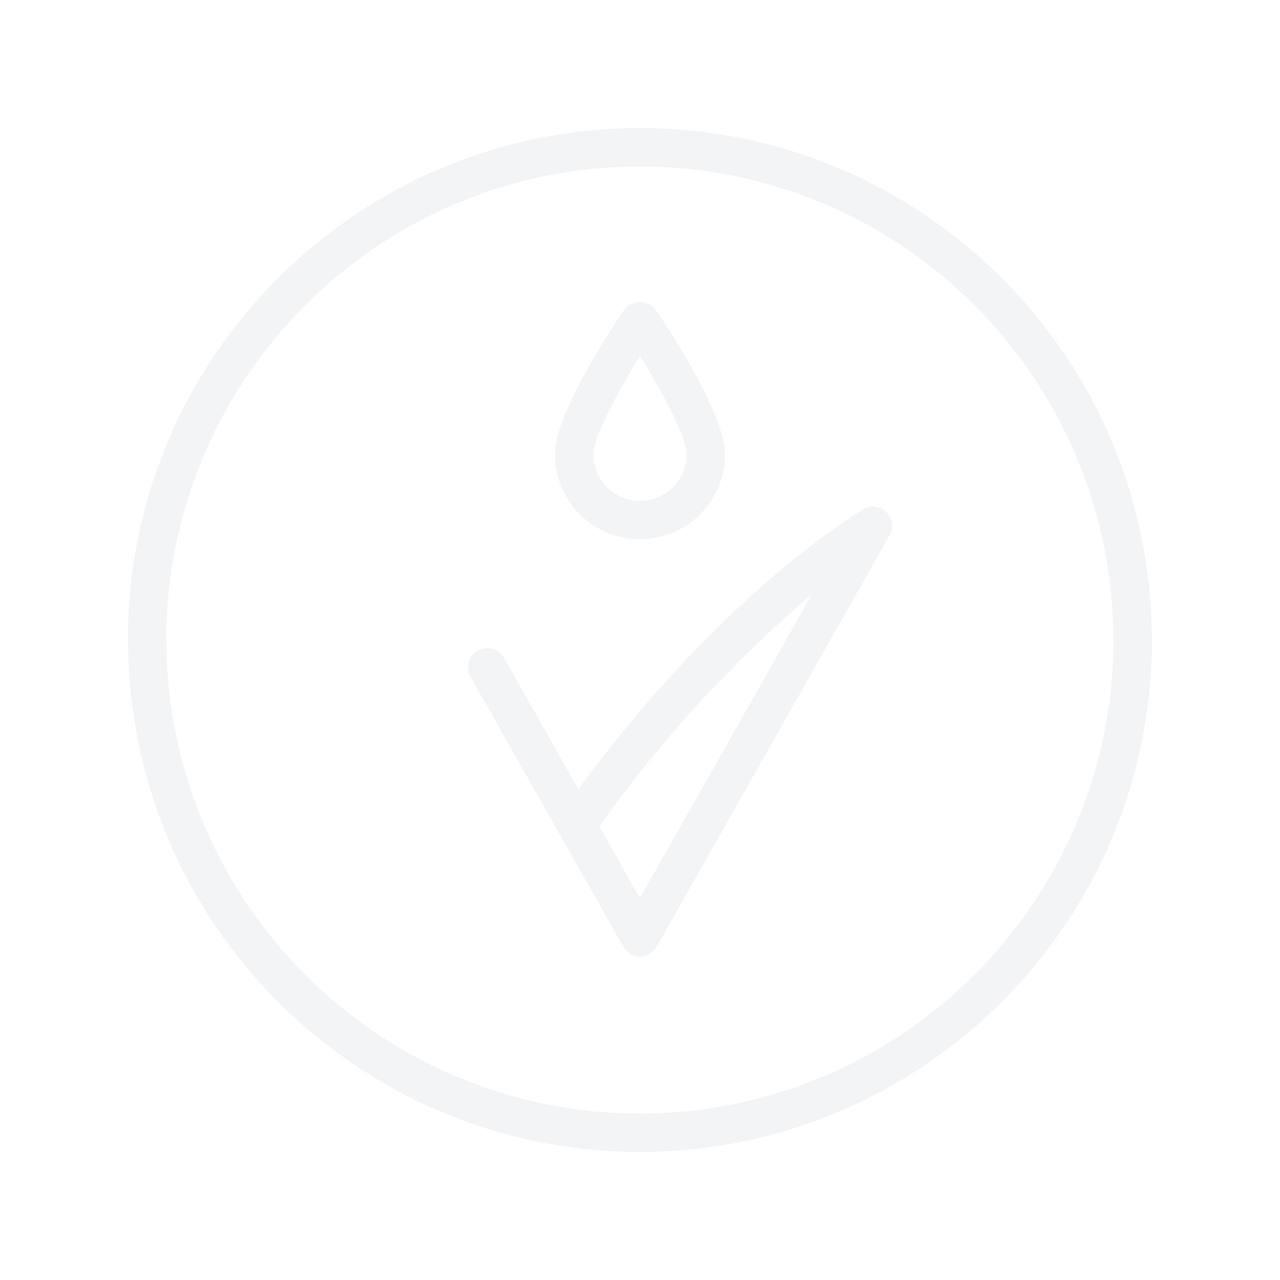 KLORANE Šampoon sidrunivilja ekstraktiga 200ml